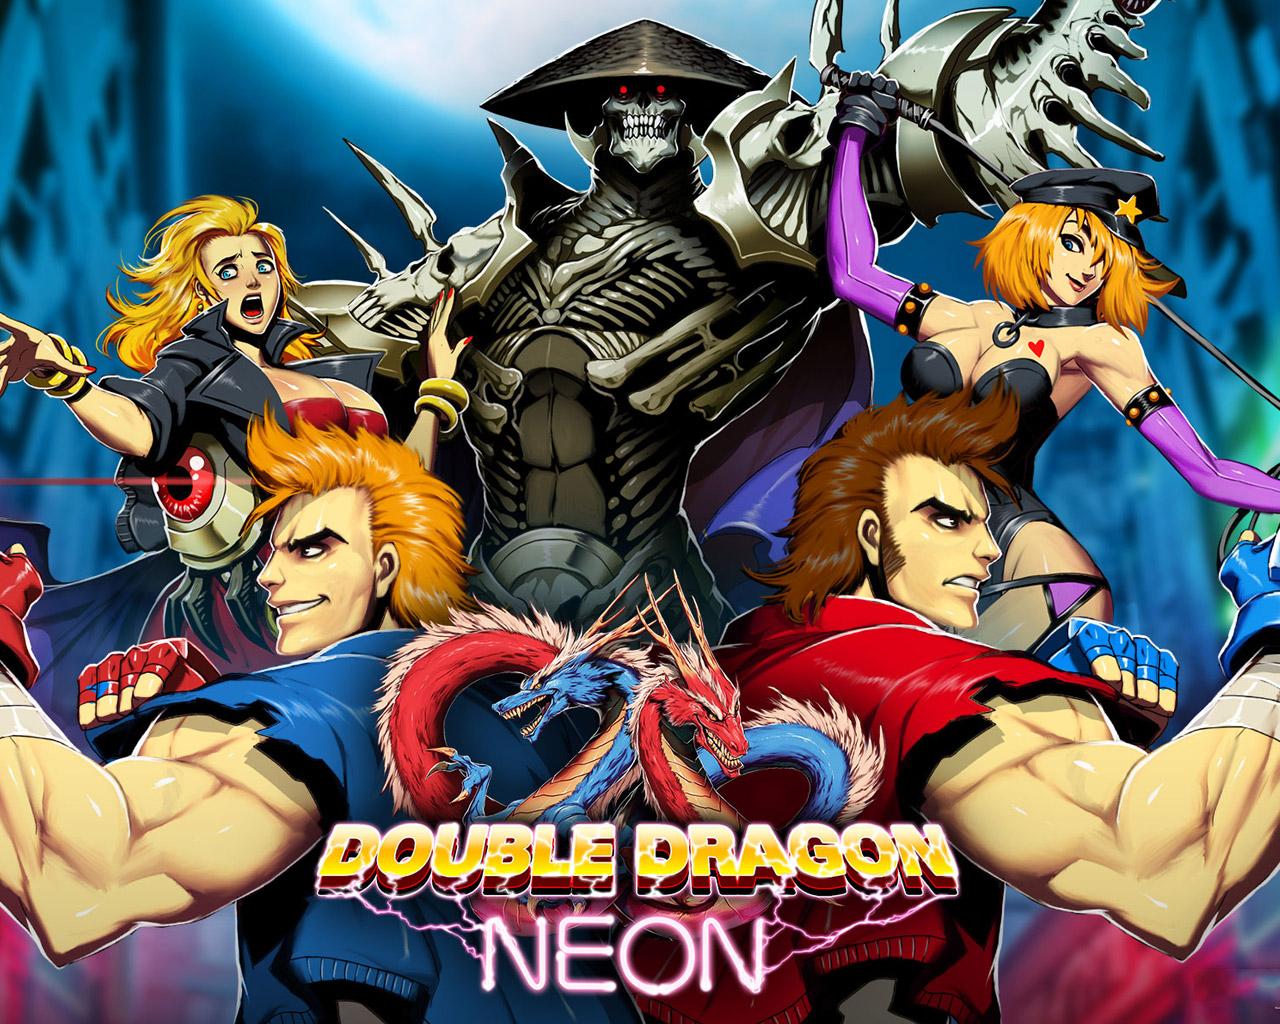 Double Dragon Neon Wallpaper in 1280x1024